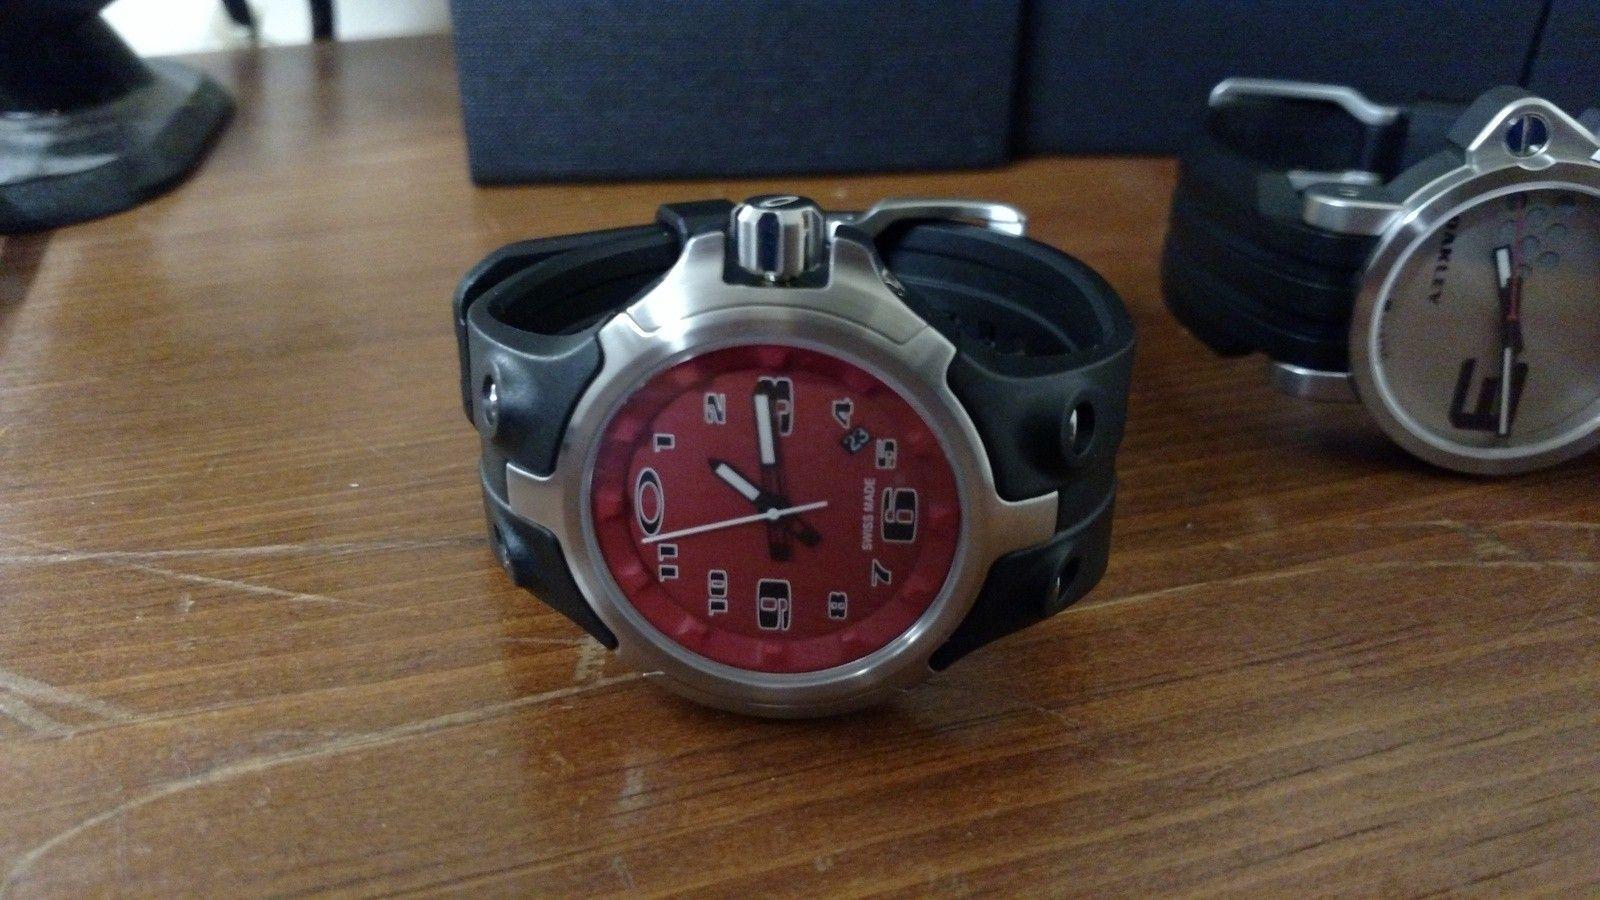 Lot of watches (cheap) - uploadfromtaptalk1446851902337.jpg